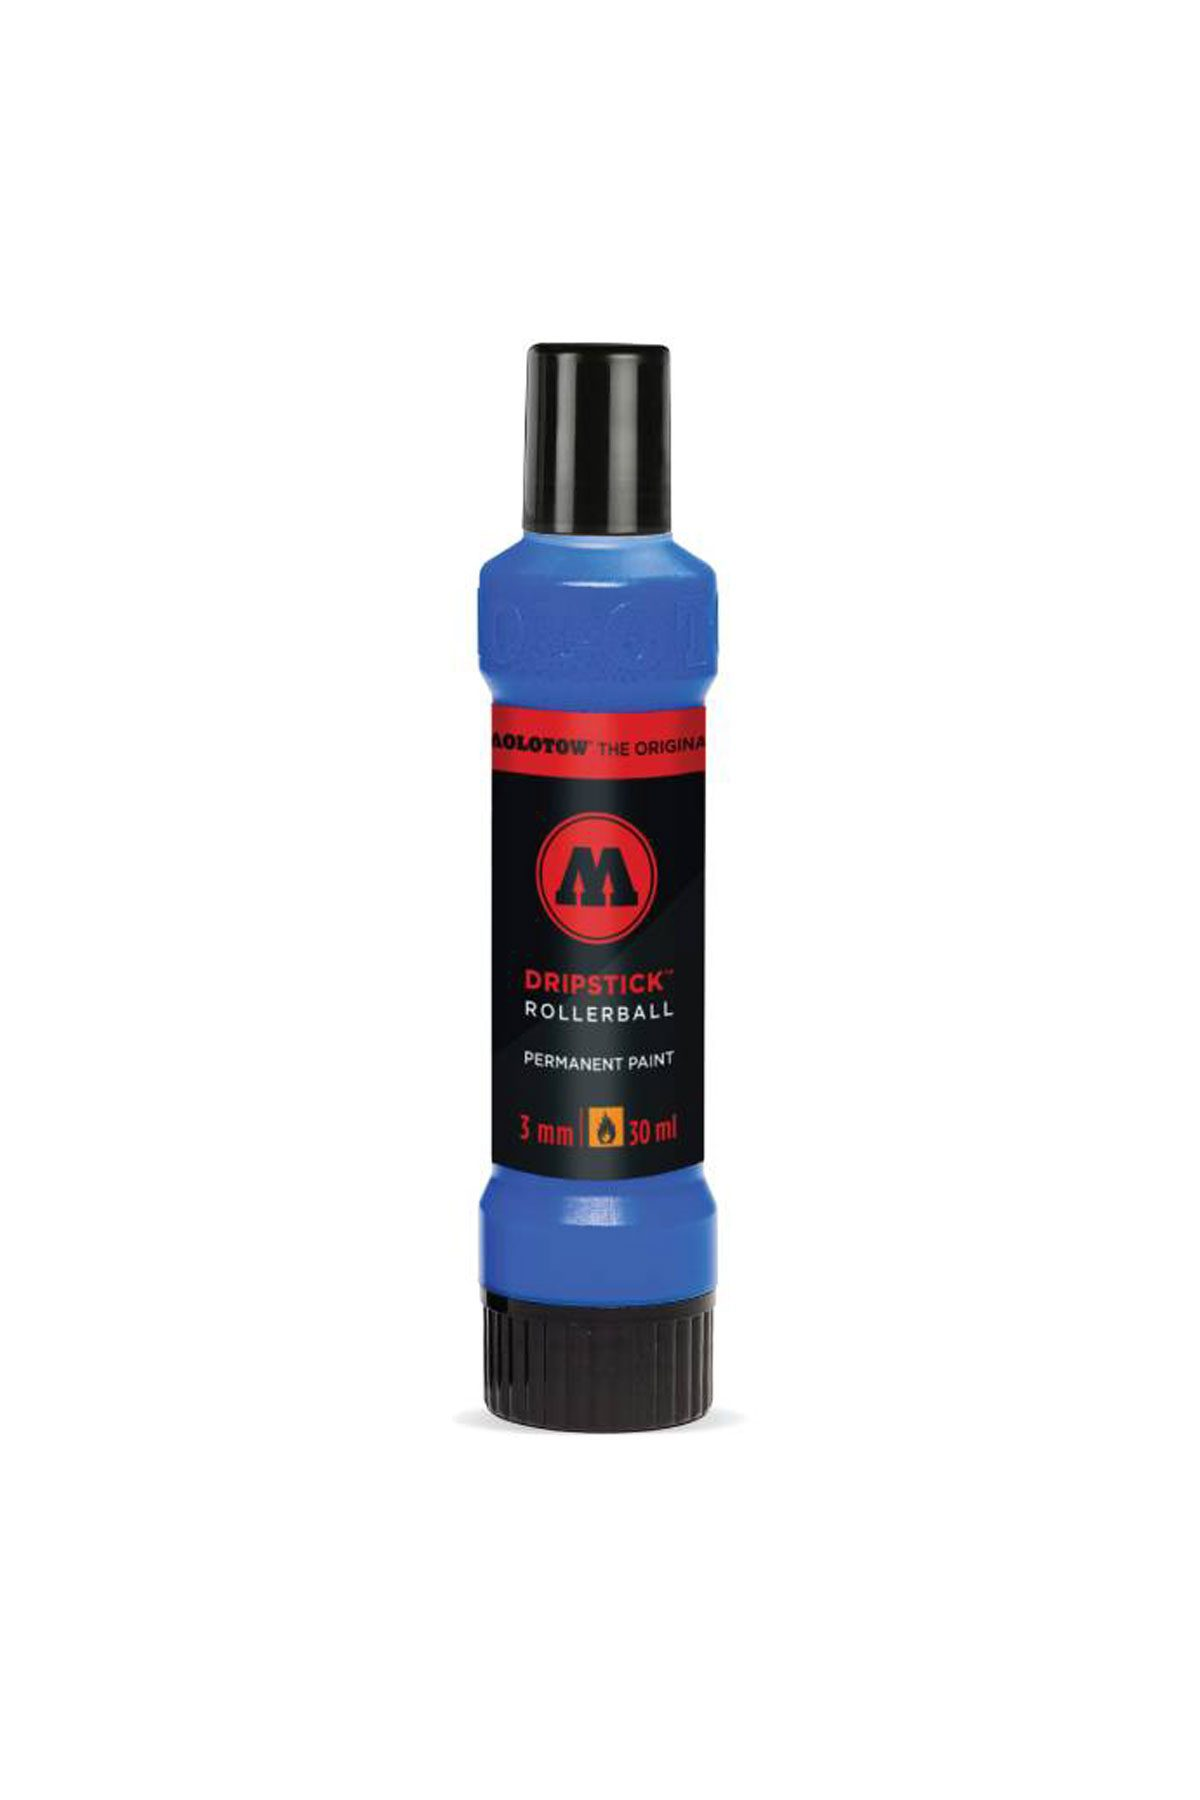 Molotow DRIPSTICK ROLLERBALL Marker 3mm